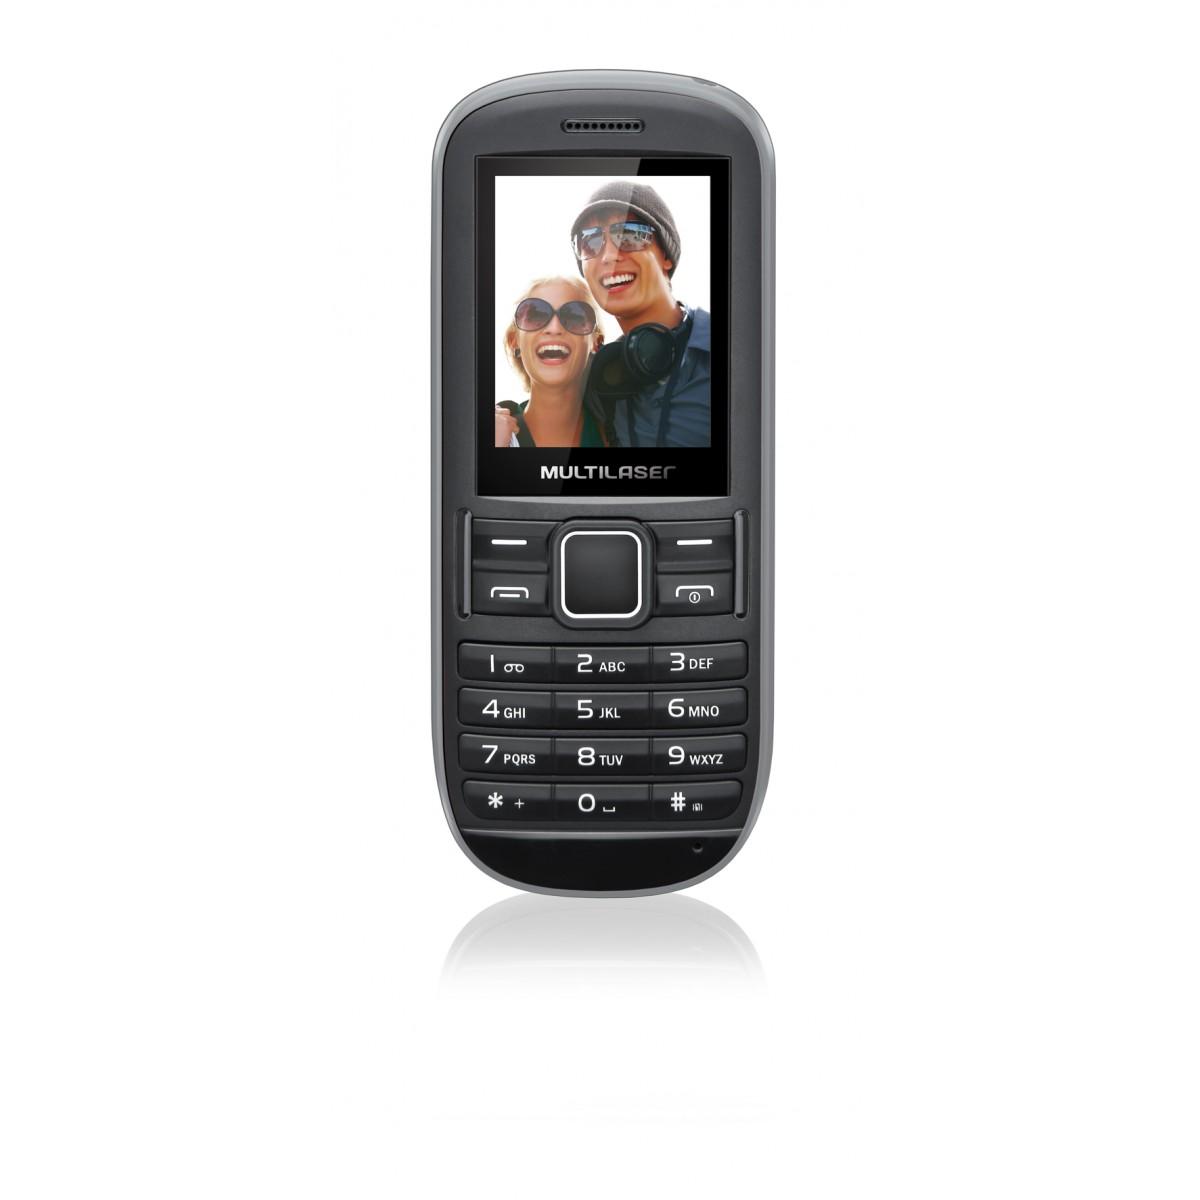 Celular Fun P3201 2 Chips Quadriband Camera MP3/4 FM Cinza/Preto